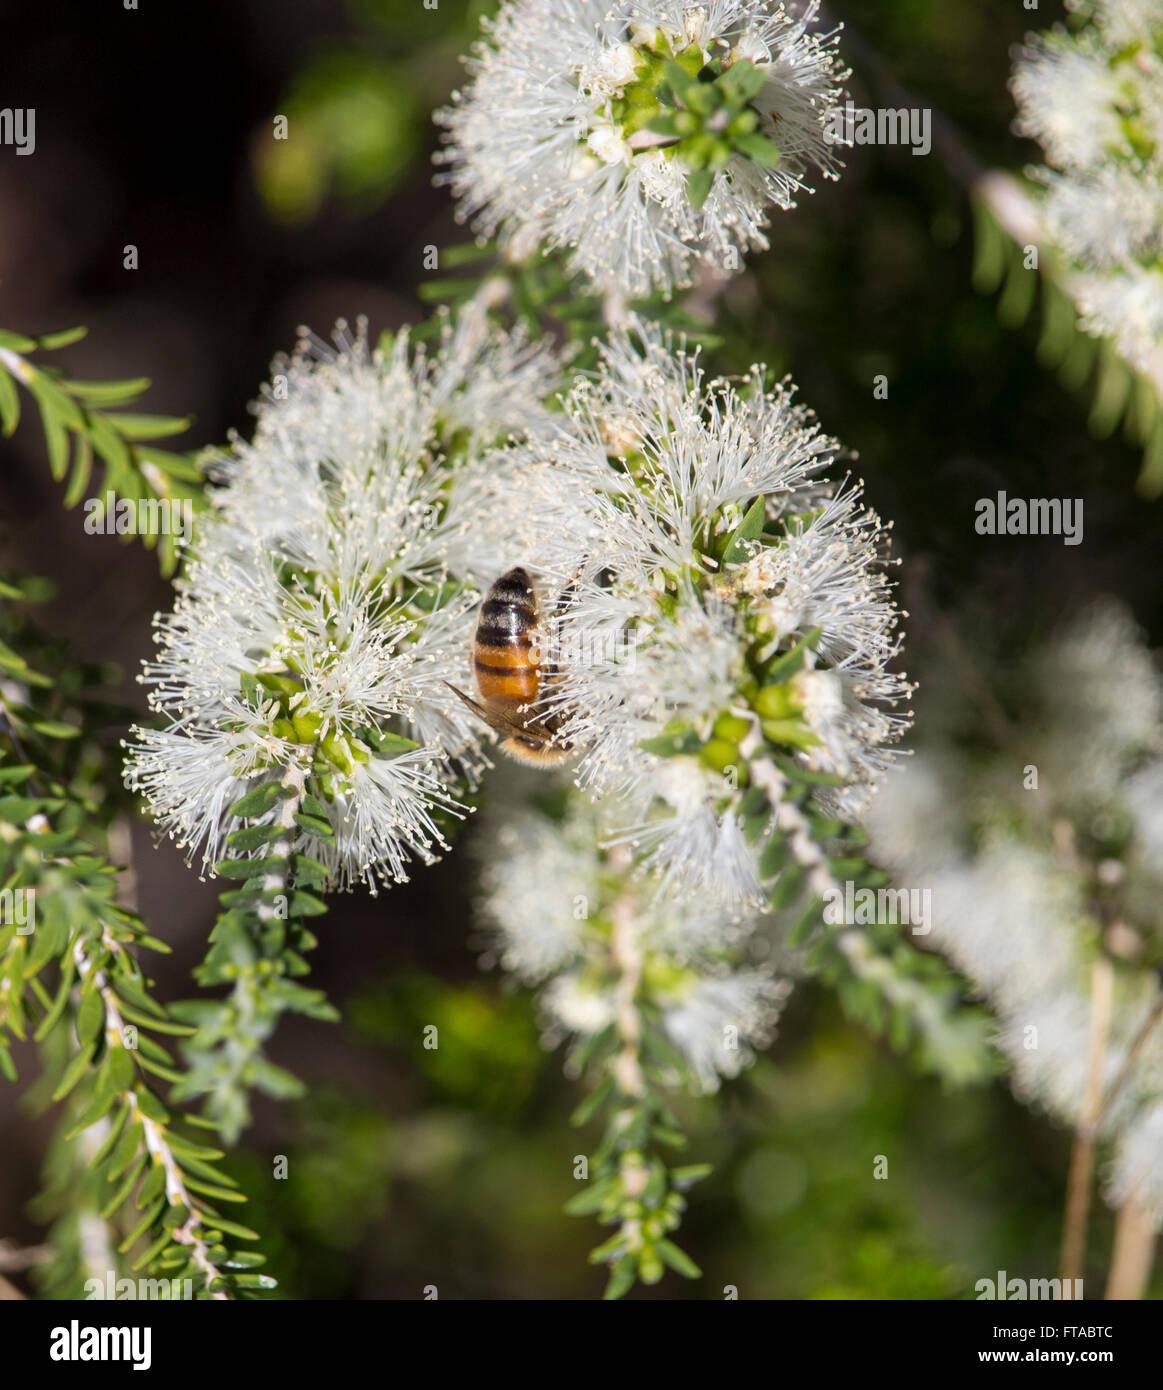 A honey bee on a white flowering Melaleuca or paper bark tree in ...